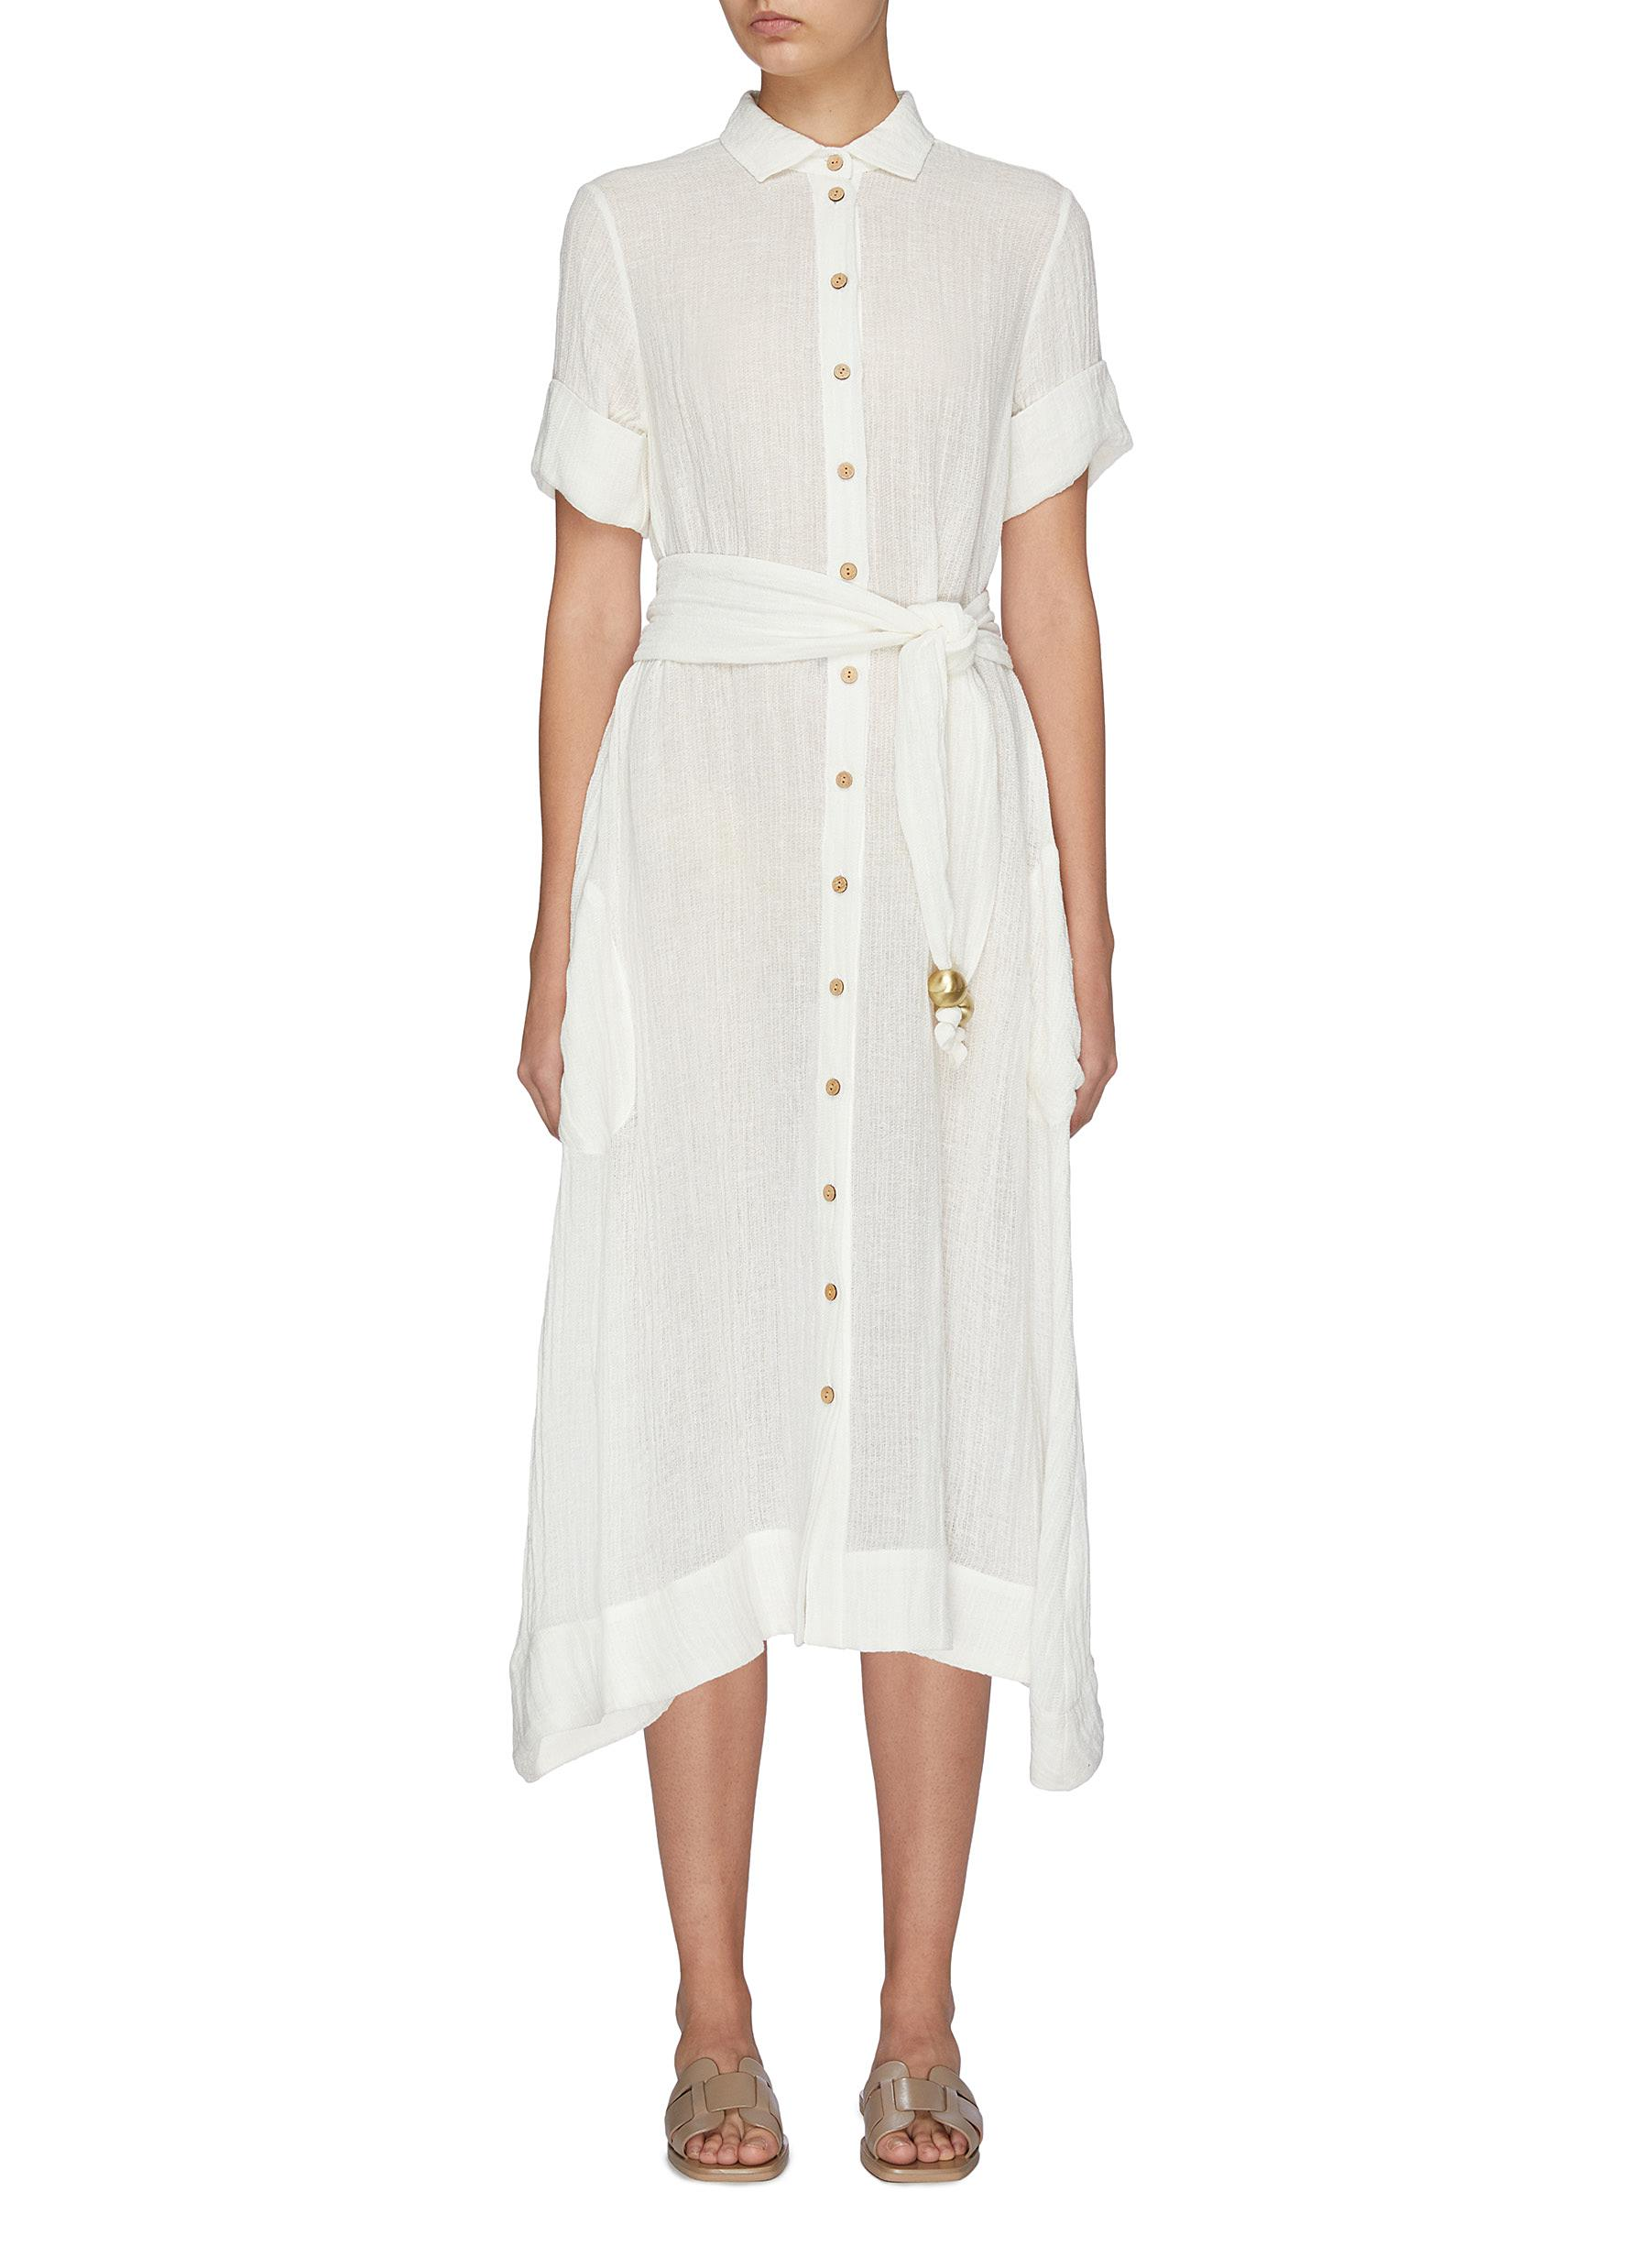 Buy Lisa Marie Fernandez Dresses Bead belted linen blend shirt dress